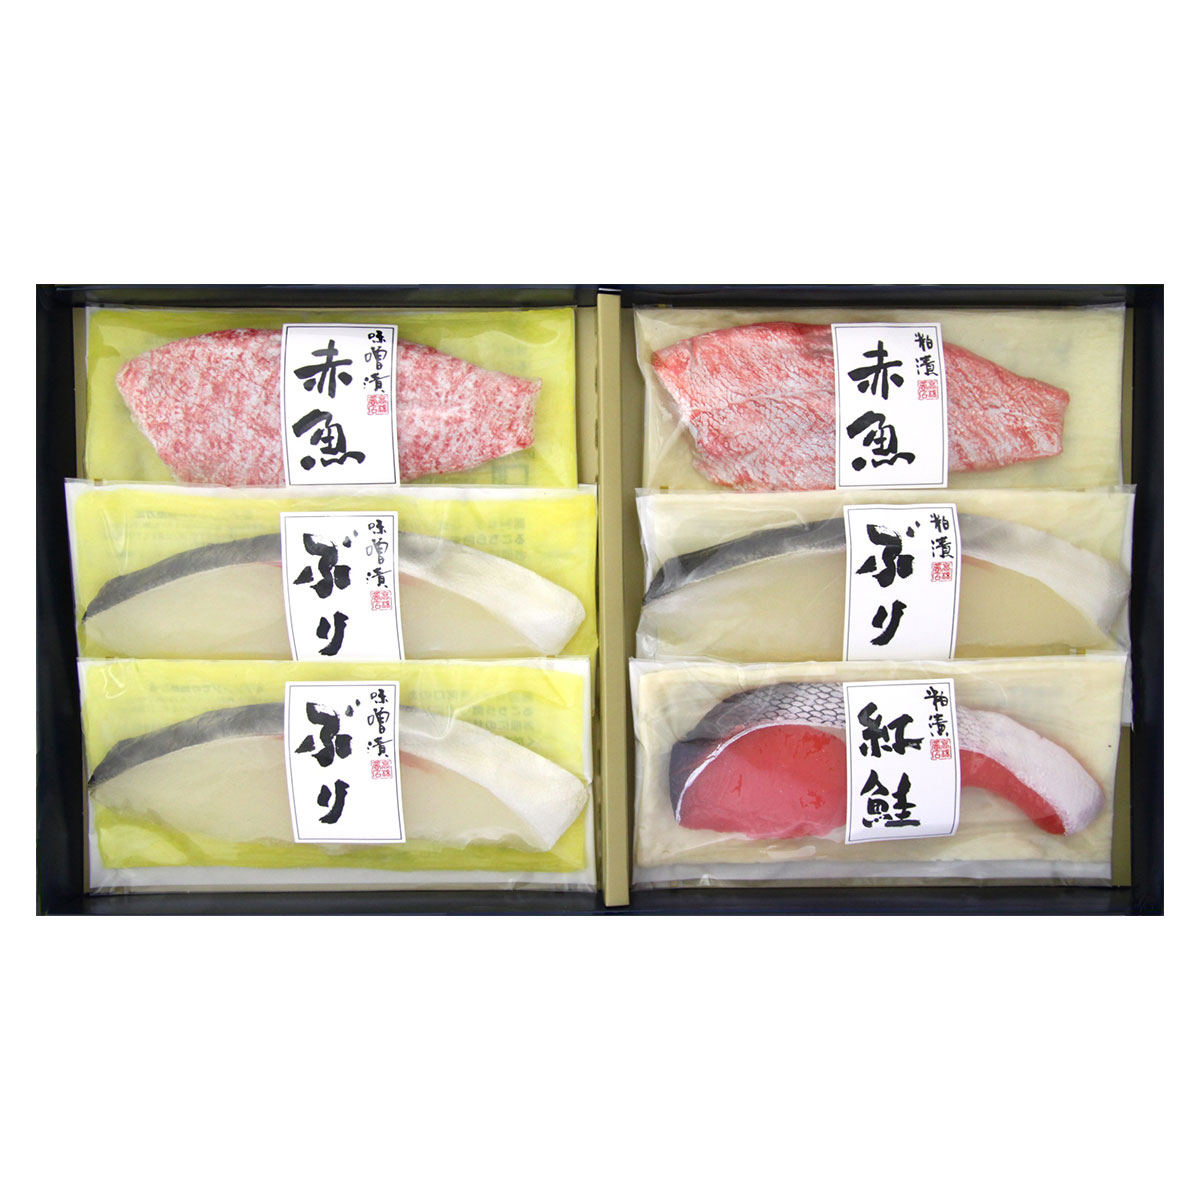 福岡特産_漬魚詰合せ